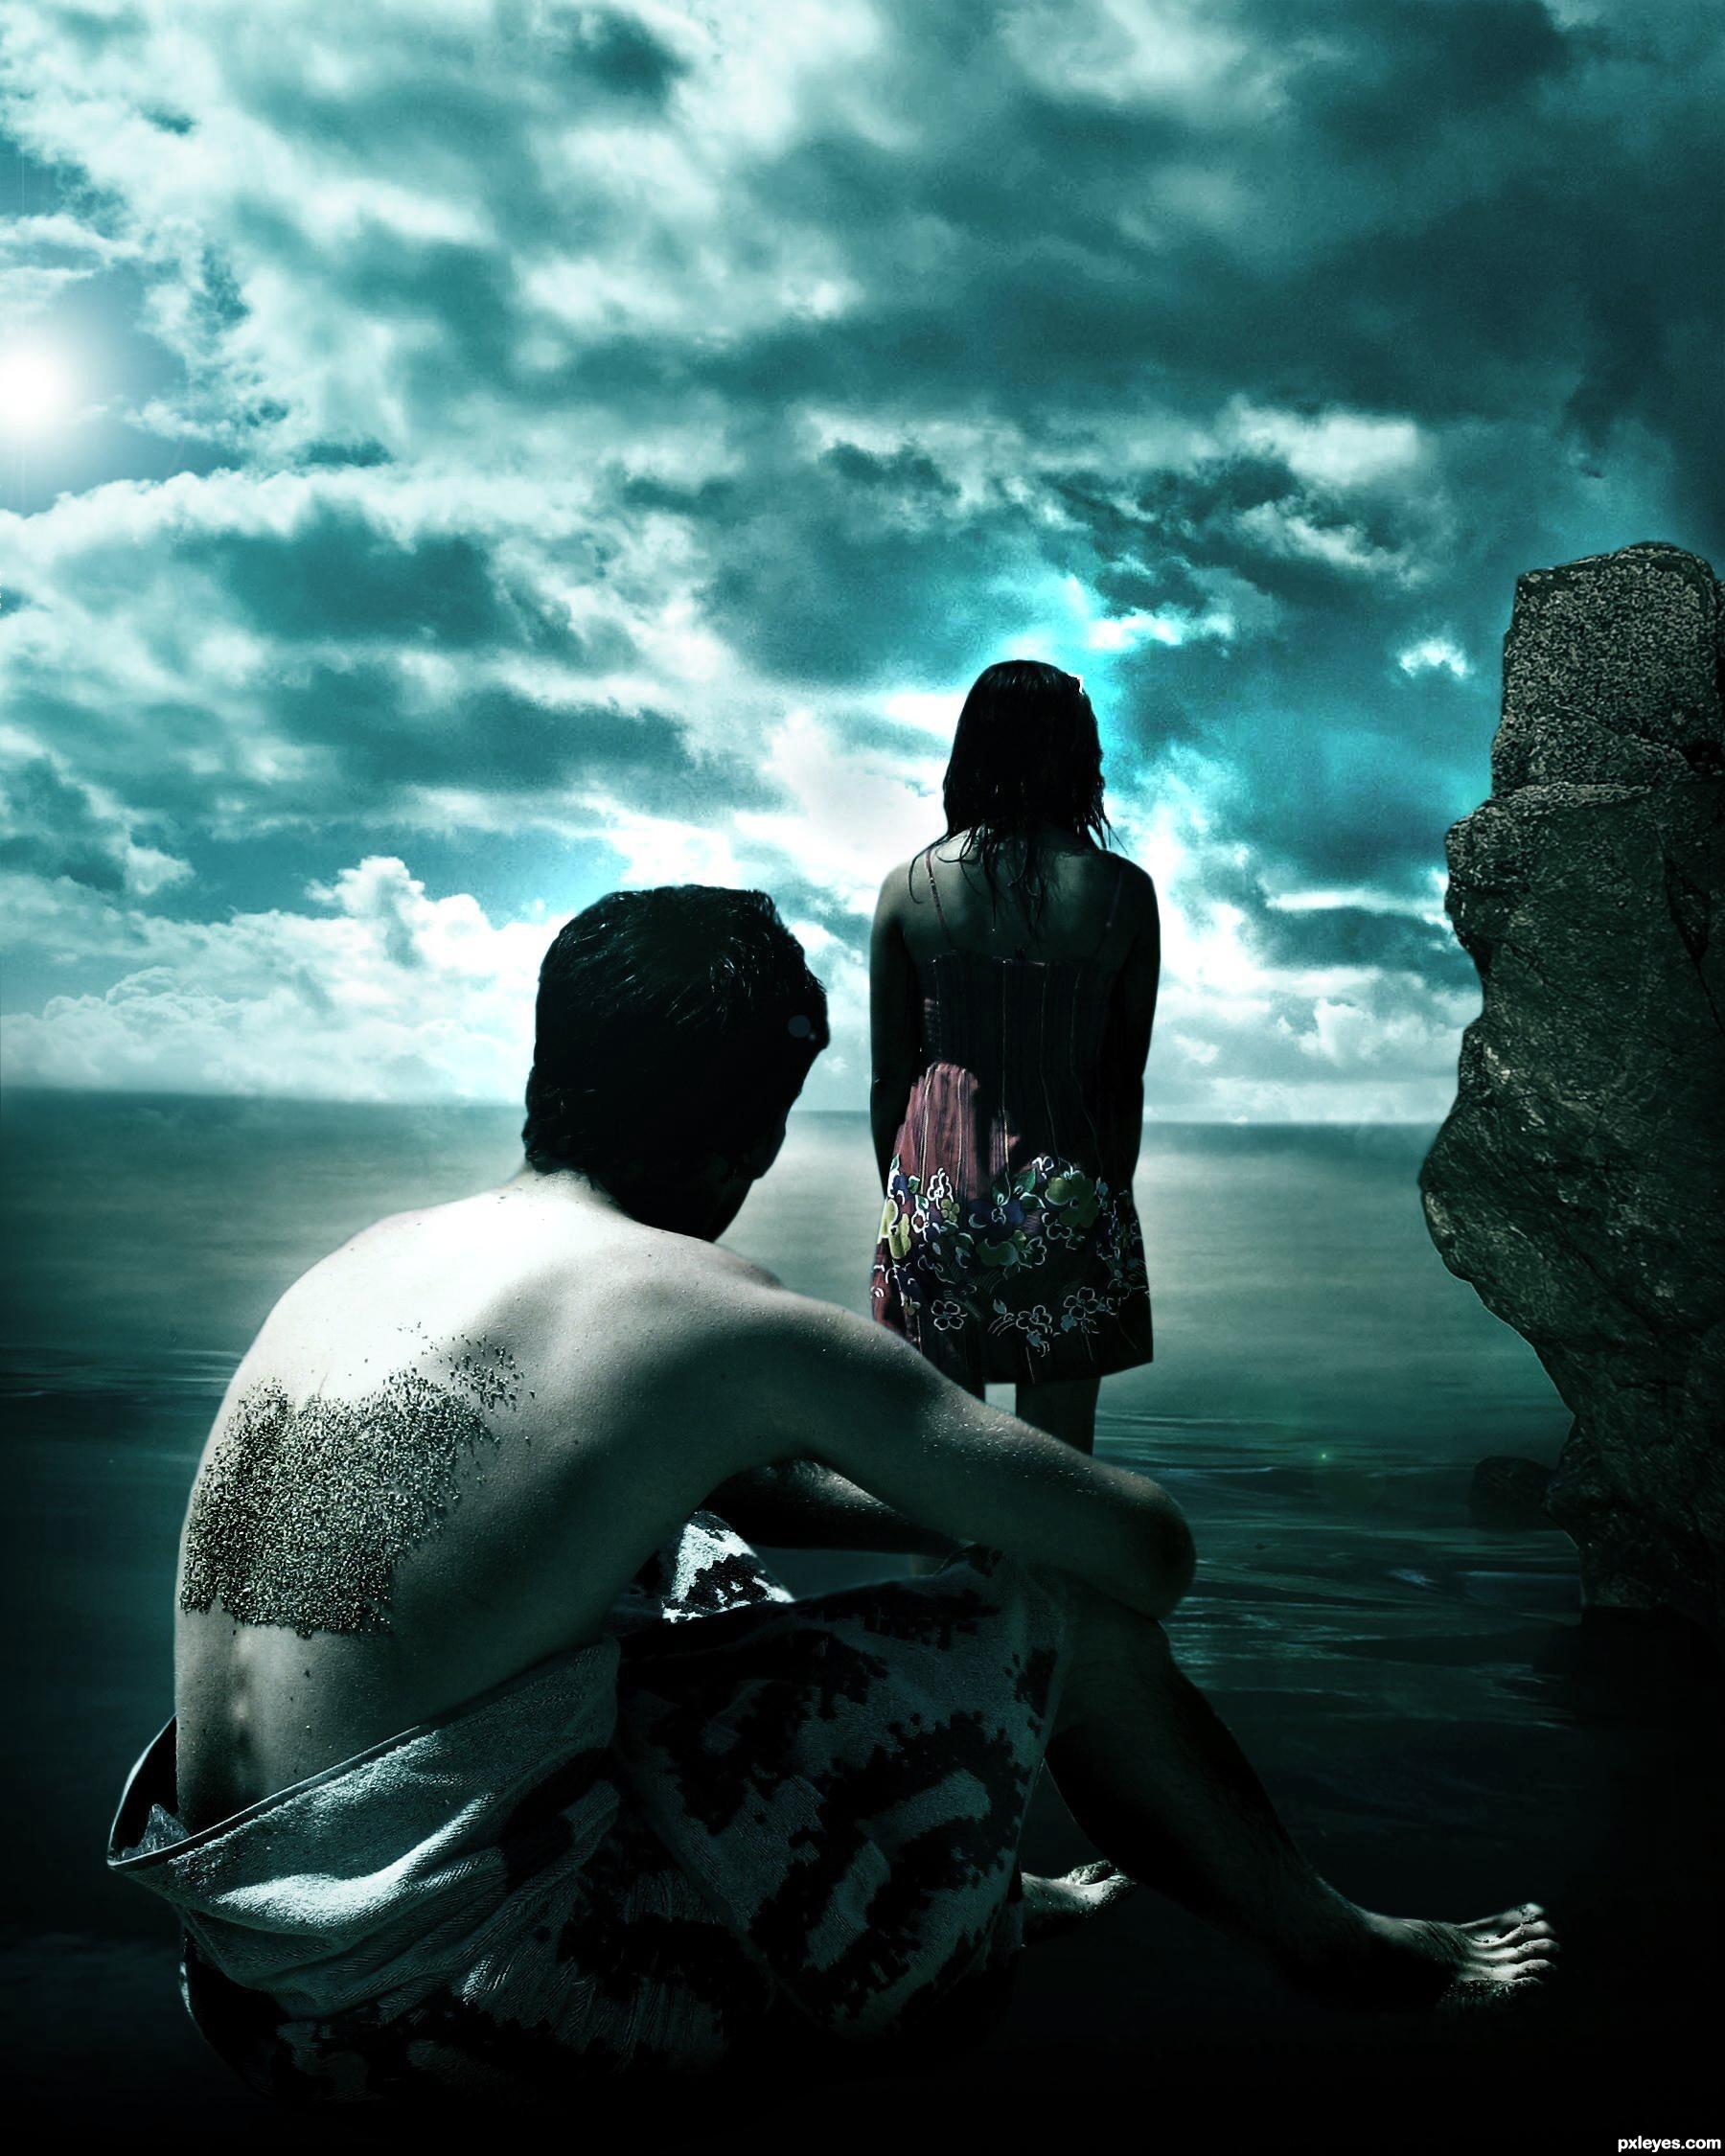 Love Makes Life Beautiful Wallpaper : Beautifull Pic - impremedia.net